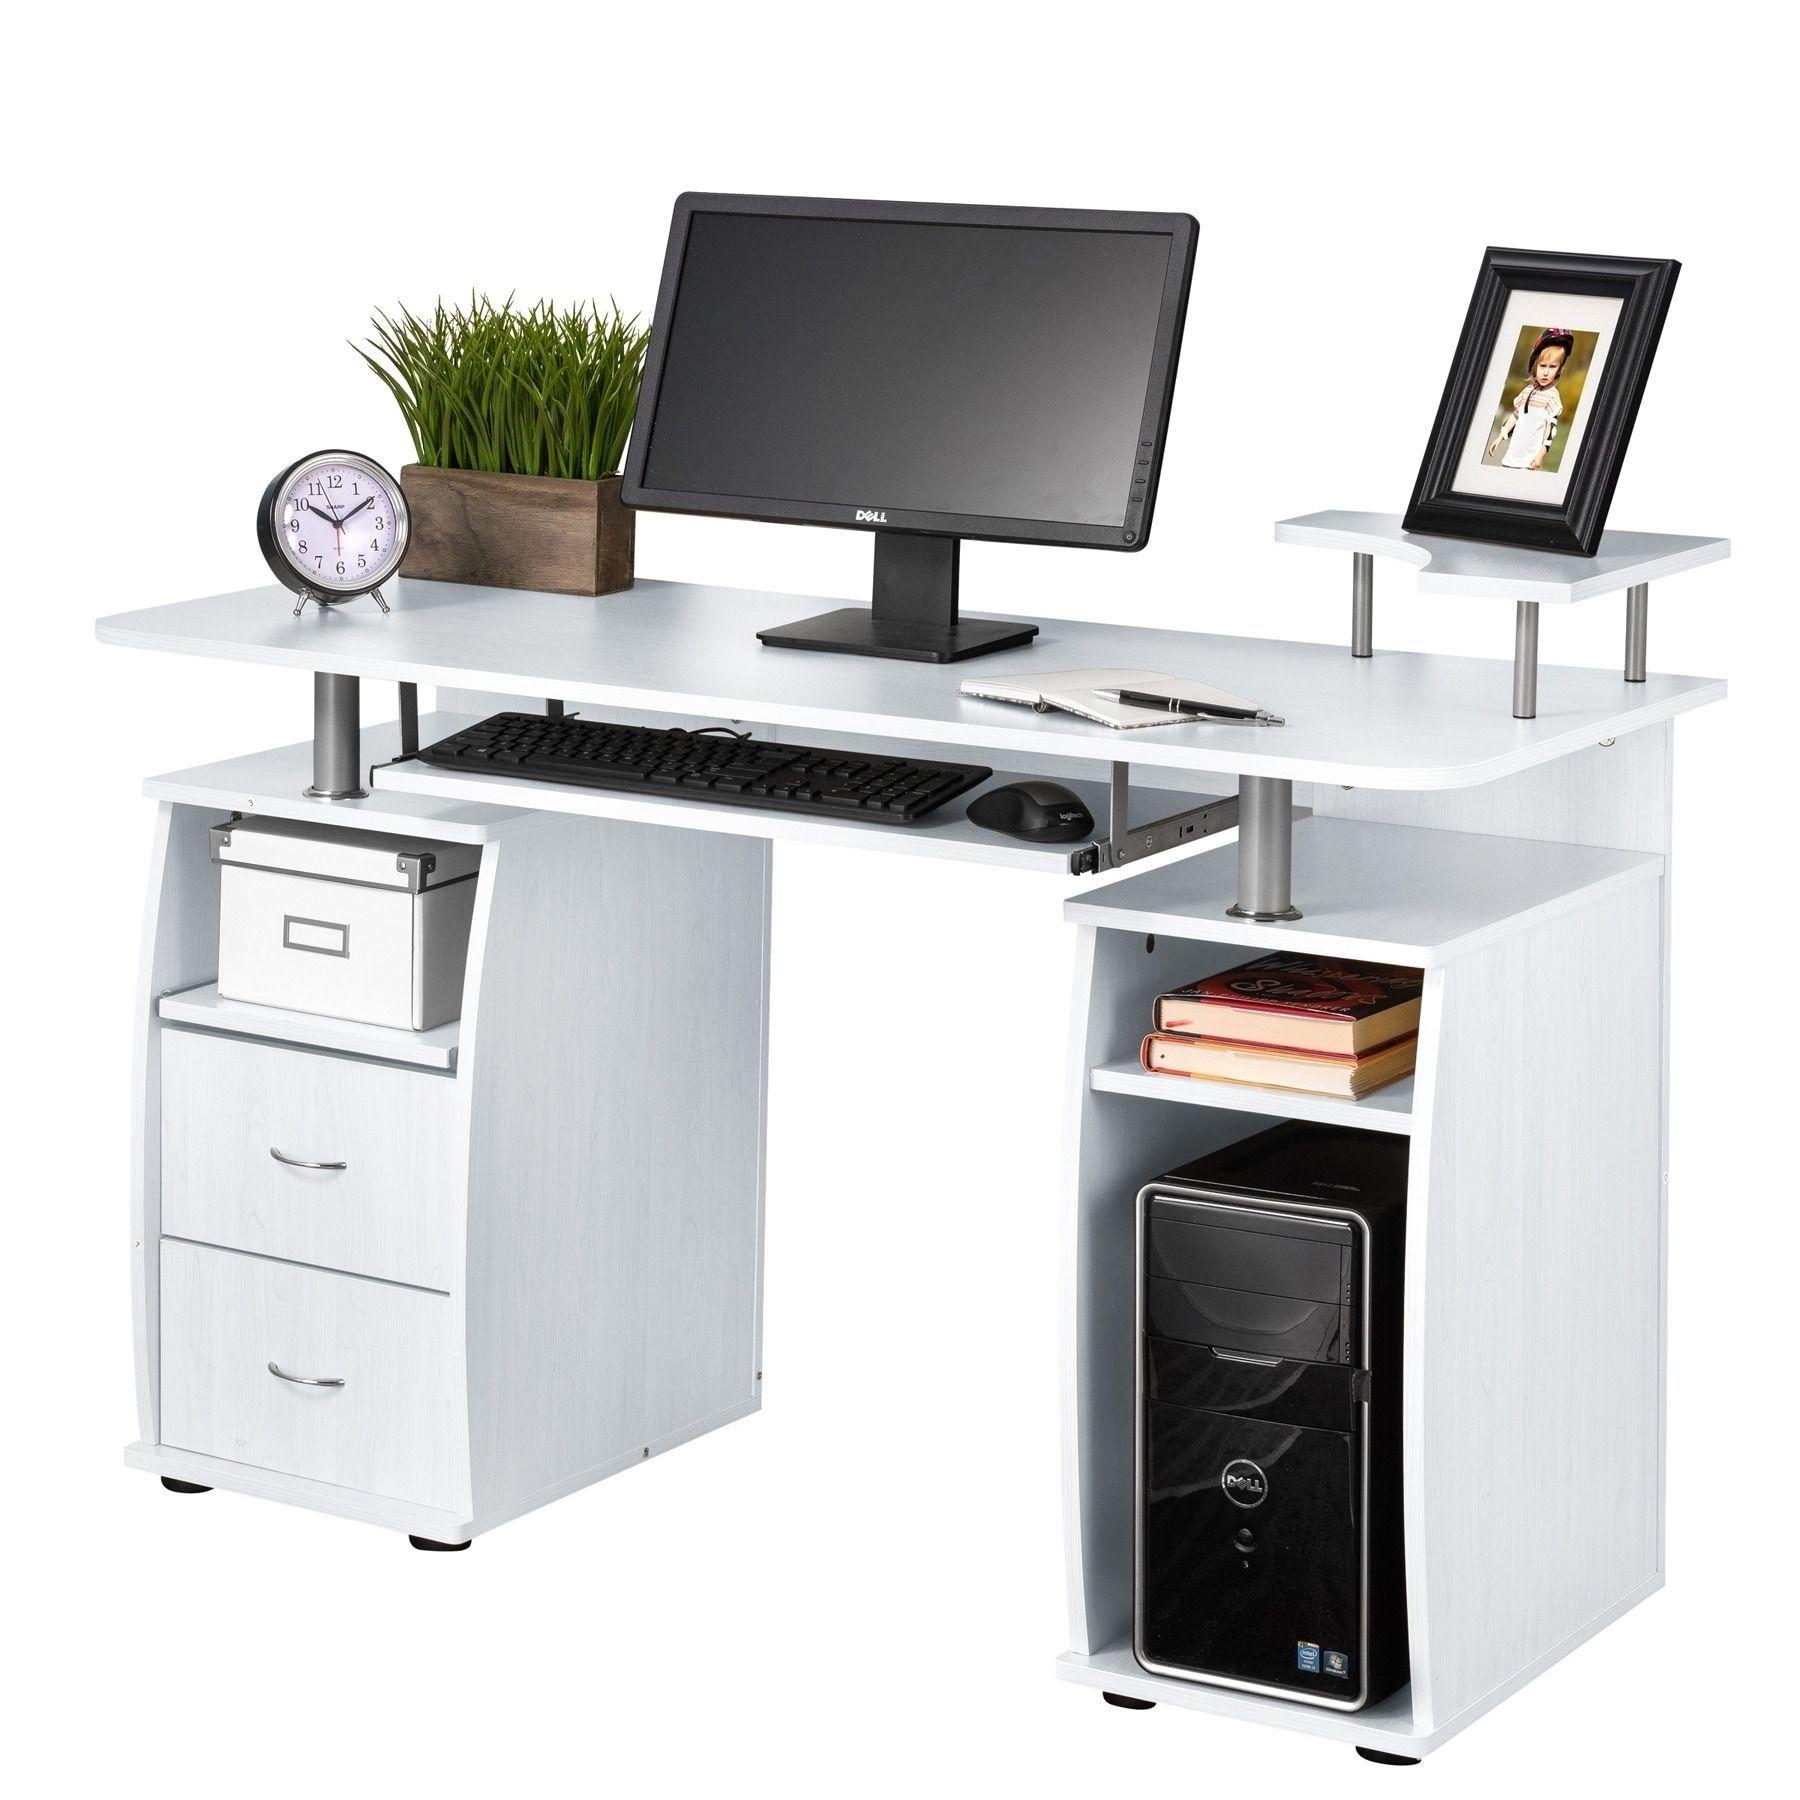 Fineboard Home Office Computer Desk (White), Size Medium | Best ...